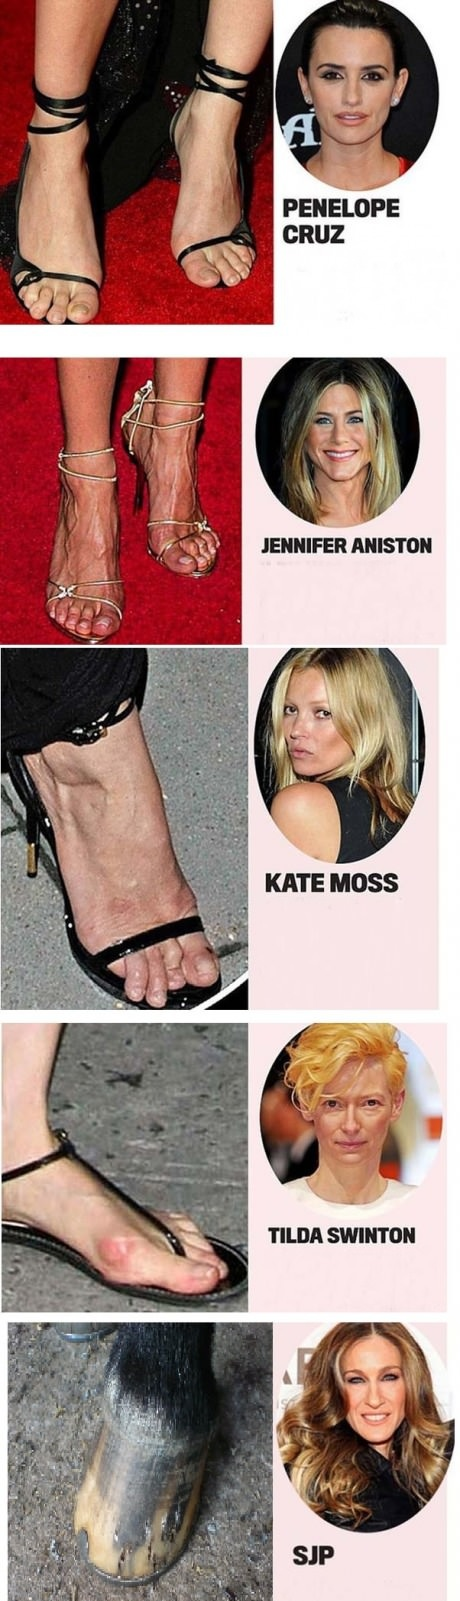 Ugliest celebrities feet